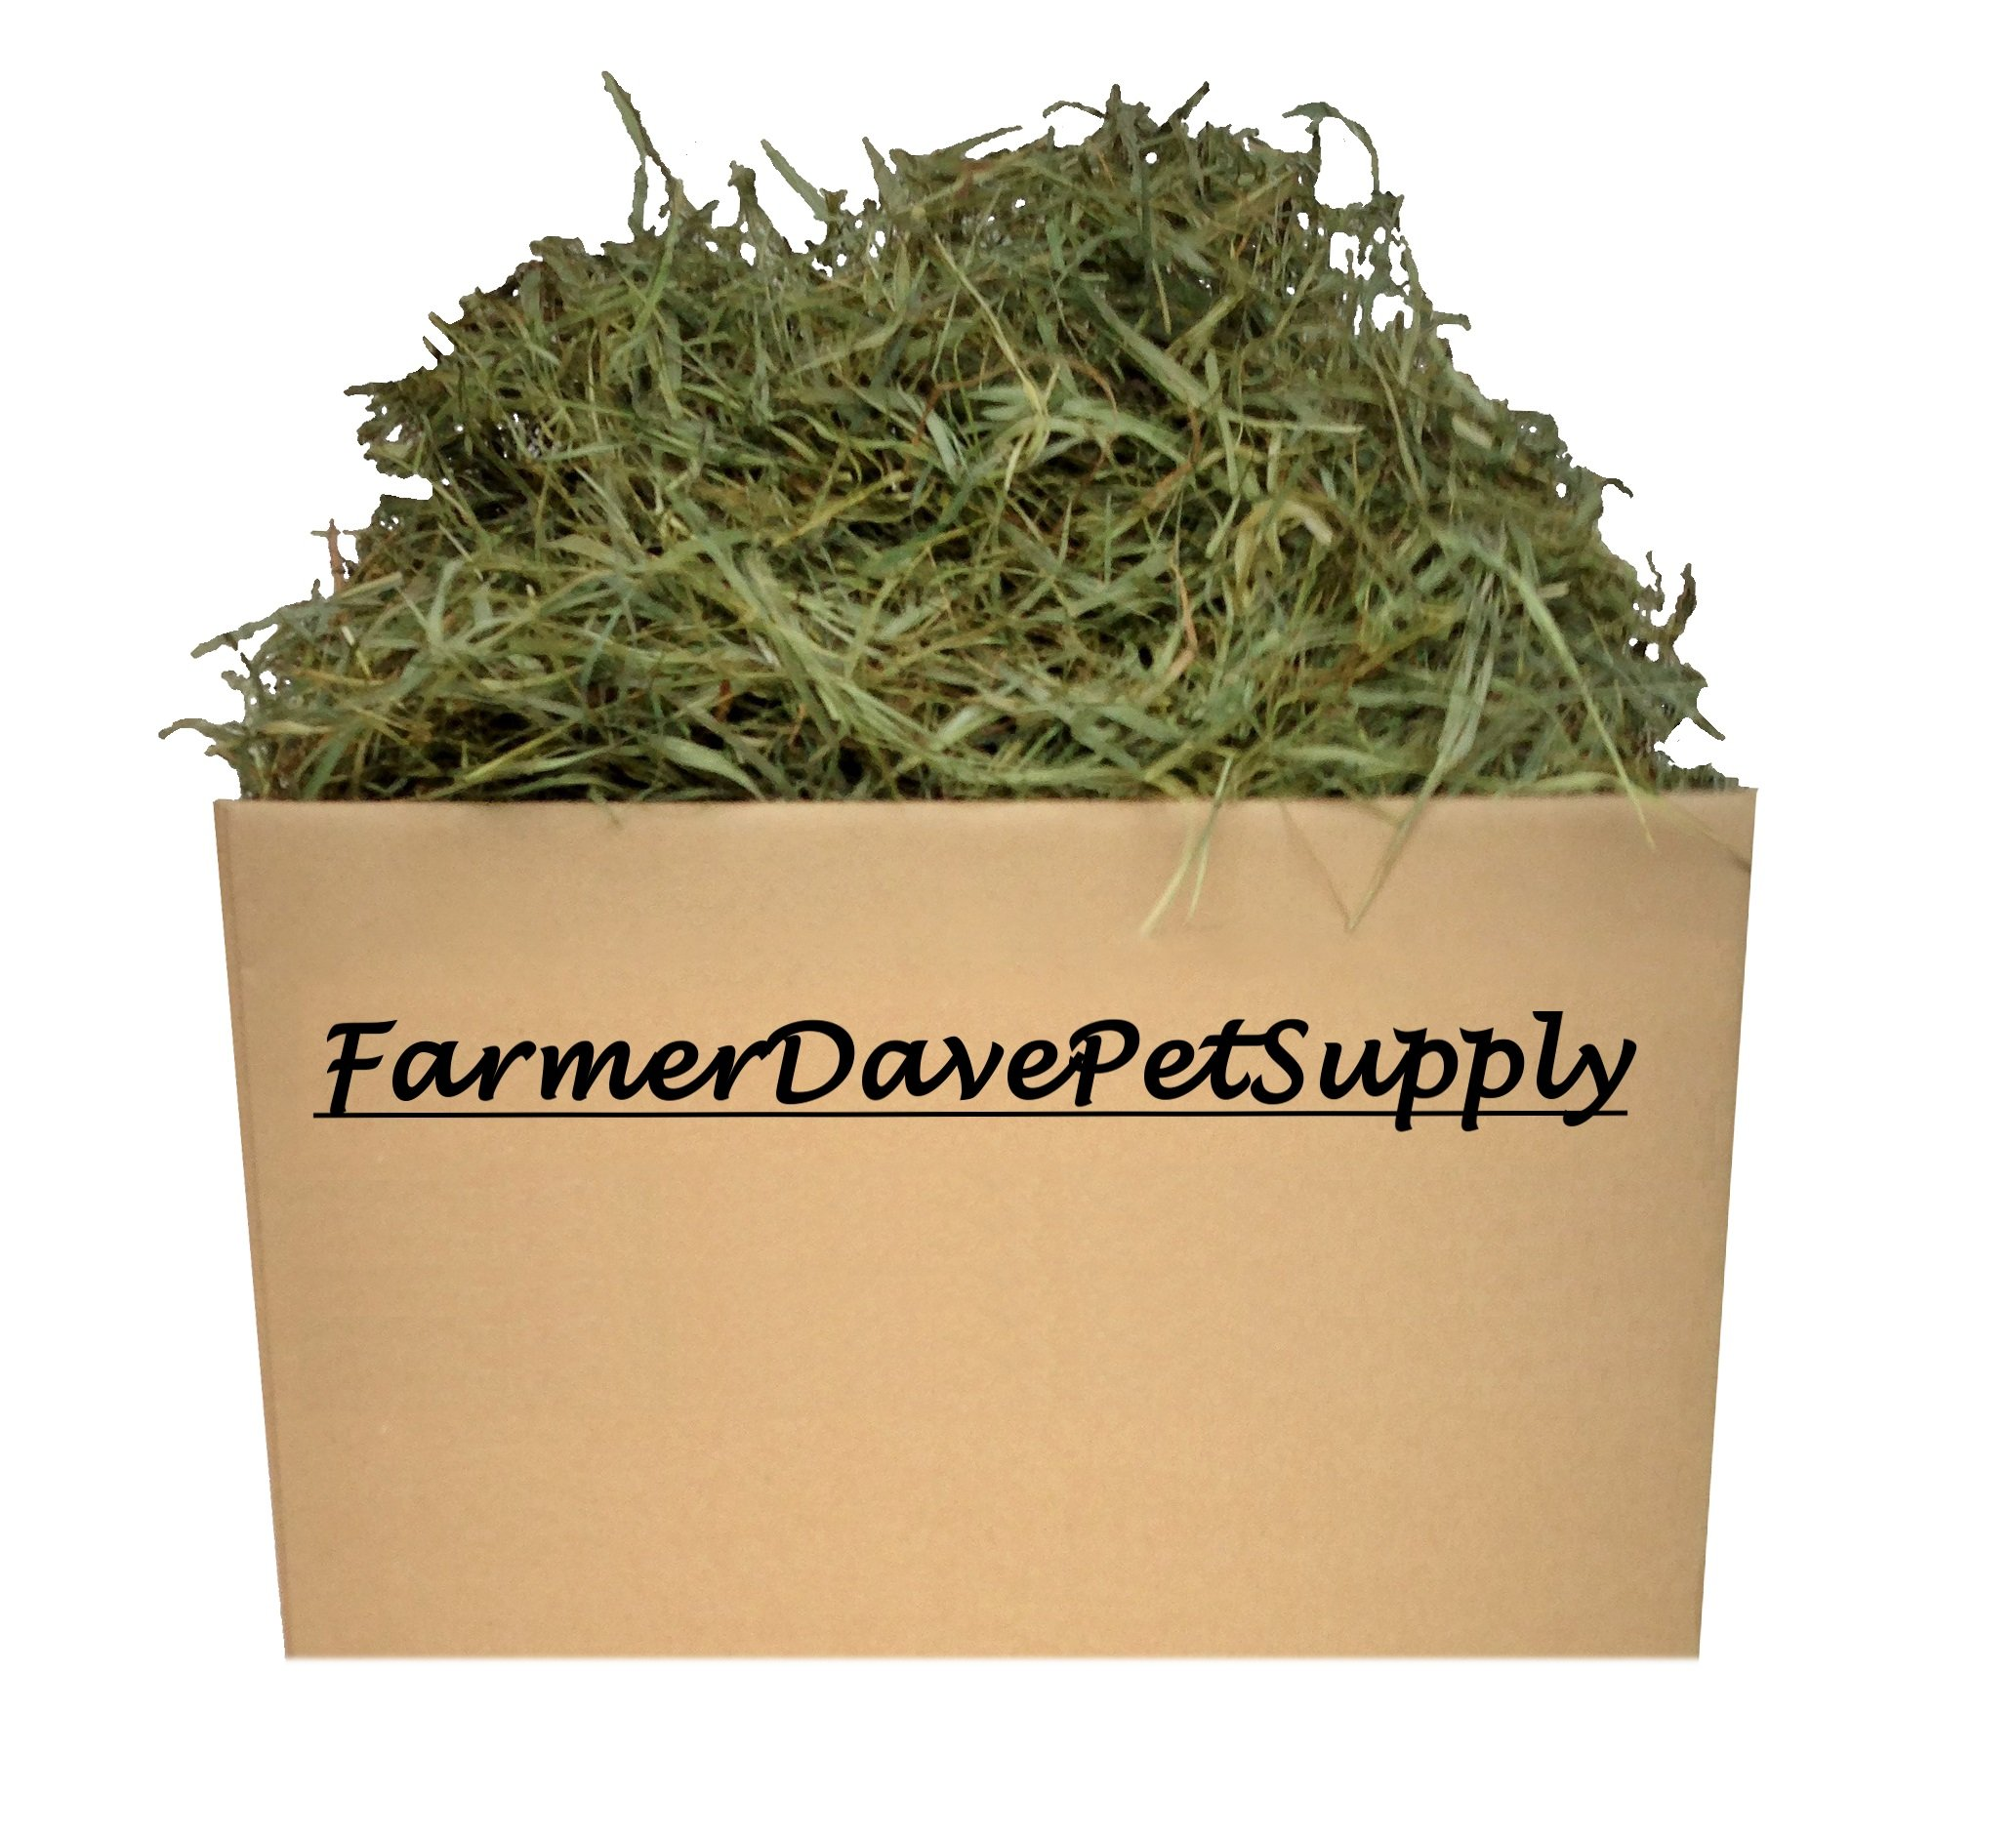 FarmerDavePetSupply 10 Lb Second Cut Timothy Hay, Bunny, Guinea Pig and Chinchilla Hay by FarmerDavePetSupply